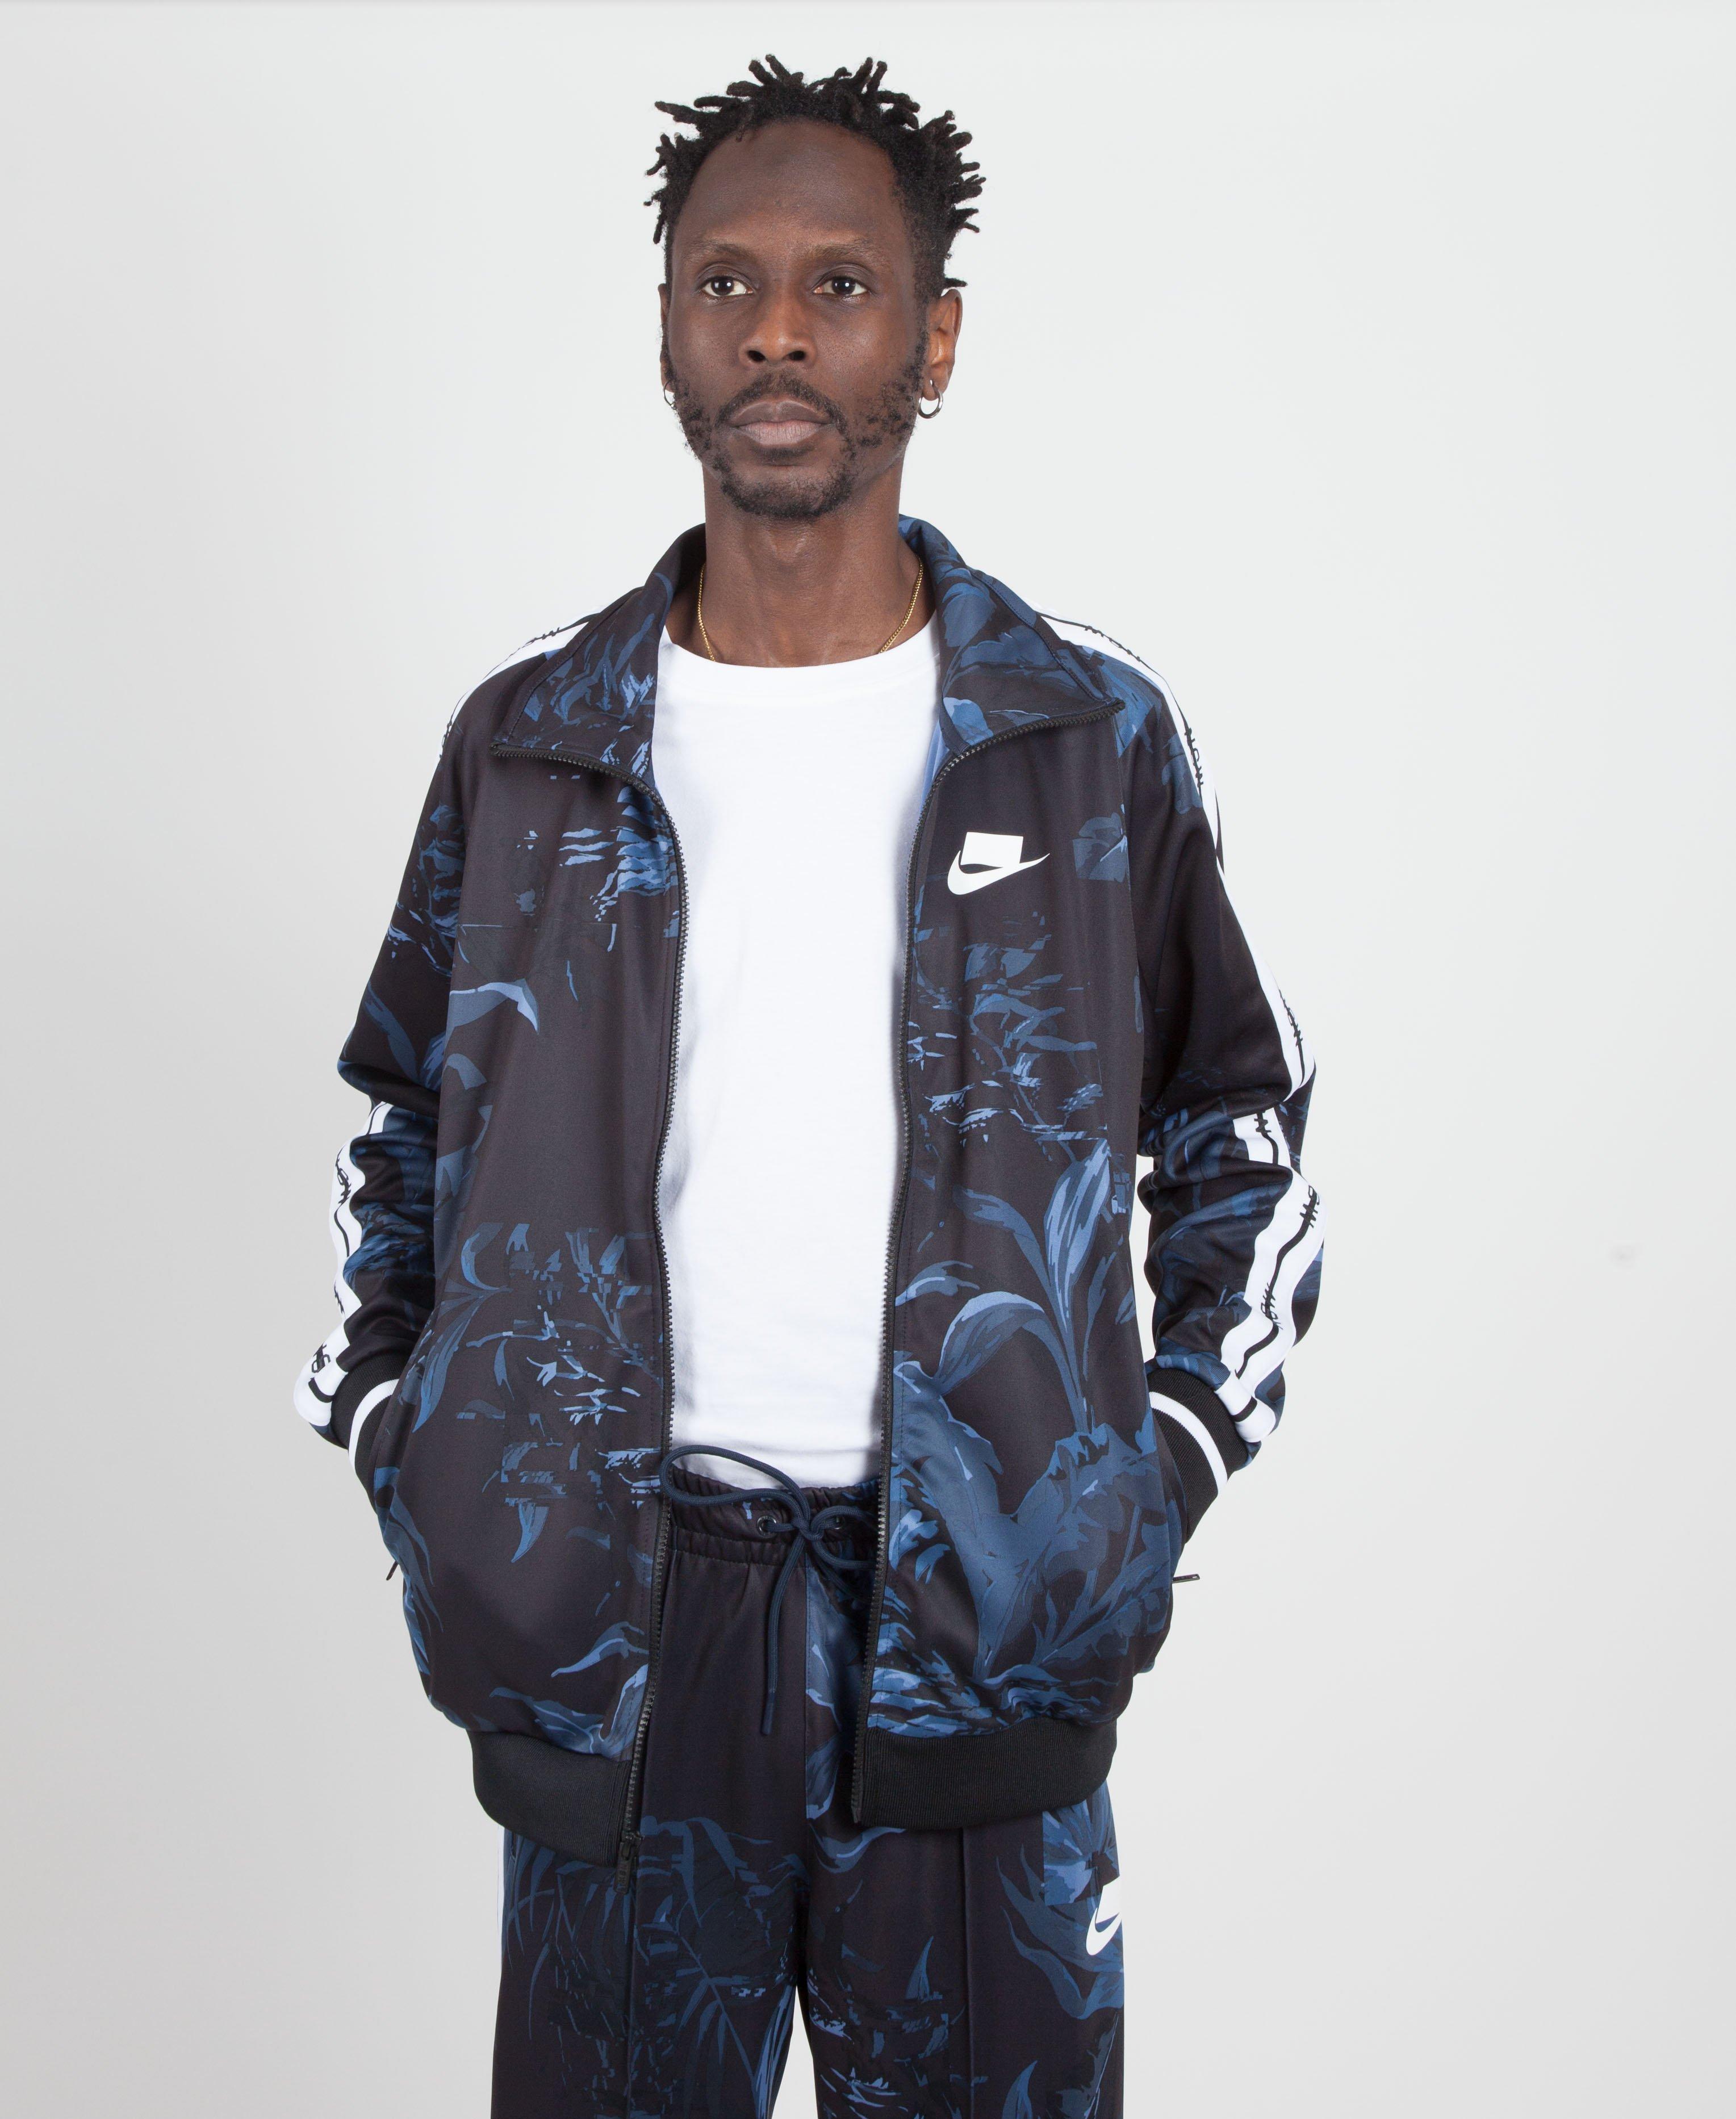 defd135930f0 Nike - Blue Black dark Obsidian white Floral Nsw Tape Track Jacket for Men.  View fullscreen